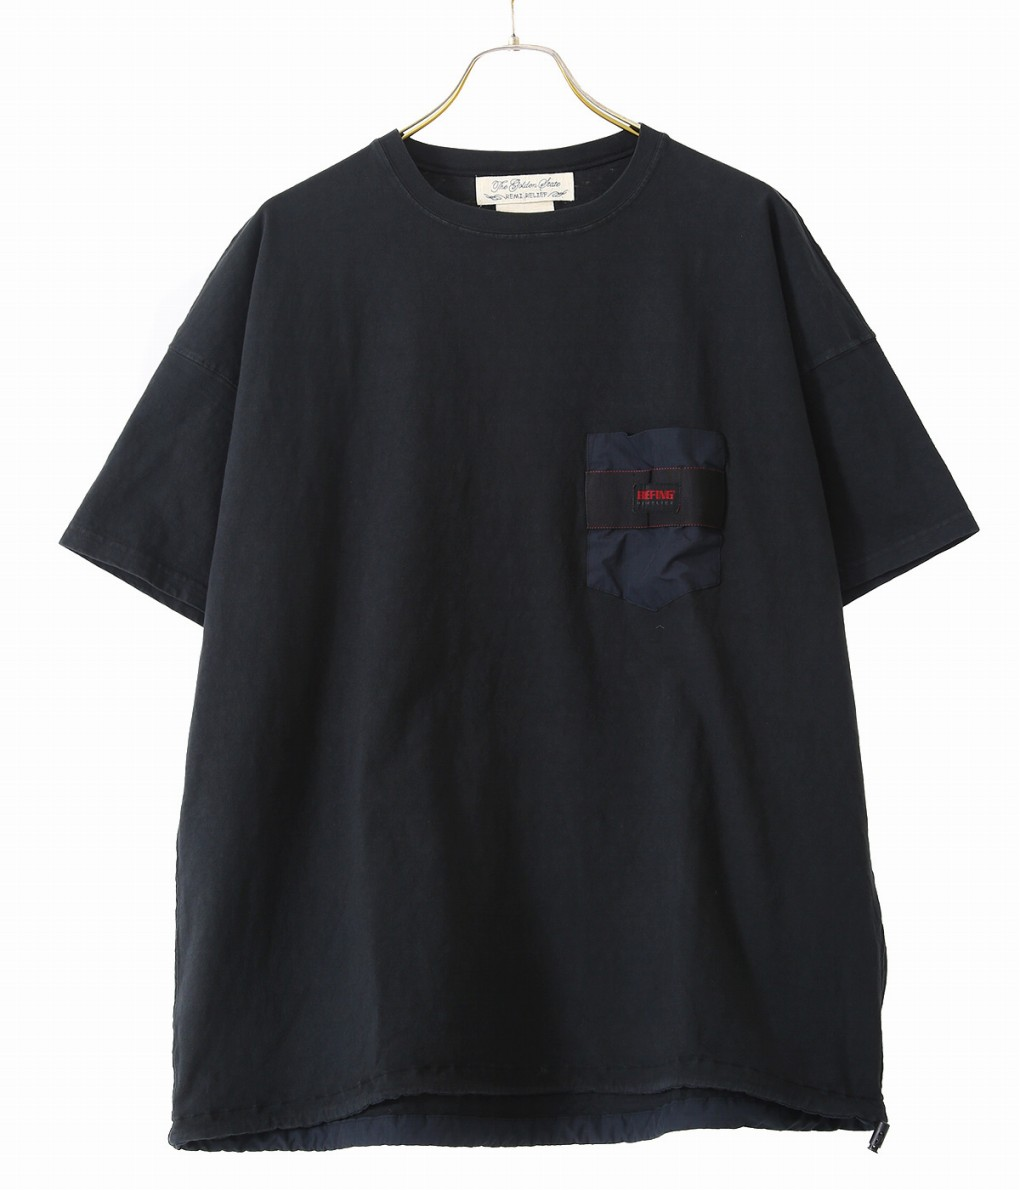 REMI RELIEF / レミレリーフ : 16/-天竺ブリーフィング半袖T : ブリーフィング コラボレーション Tシャツ メンズ : RN20269183 【PIE】